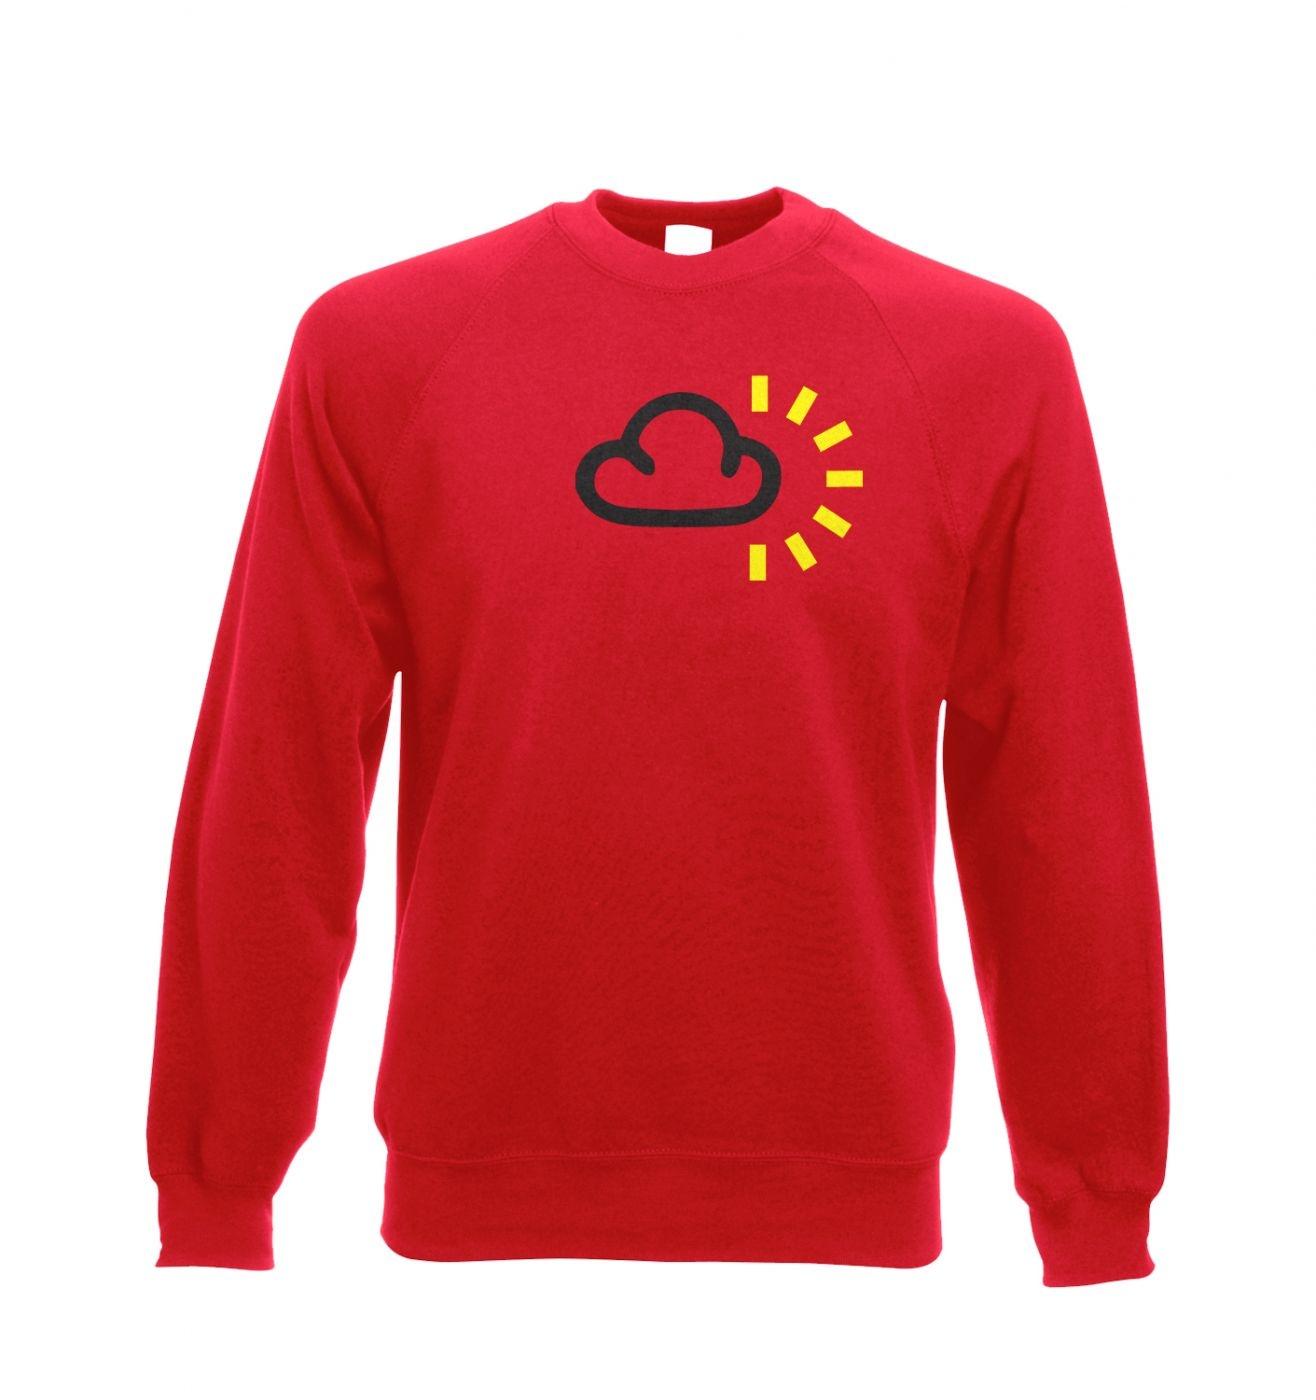 Weather Symbol Dark Clouds with Sun Adult Crewneck Sweatshirt